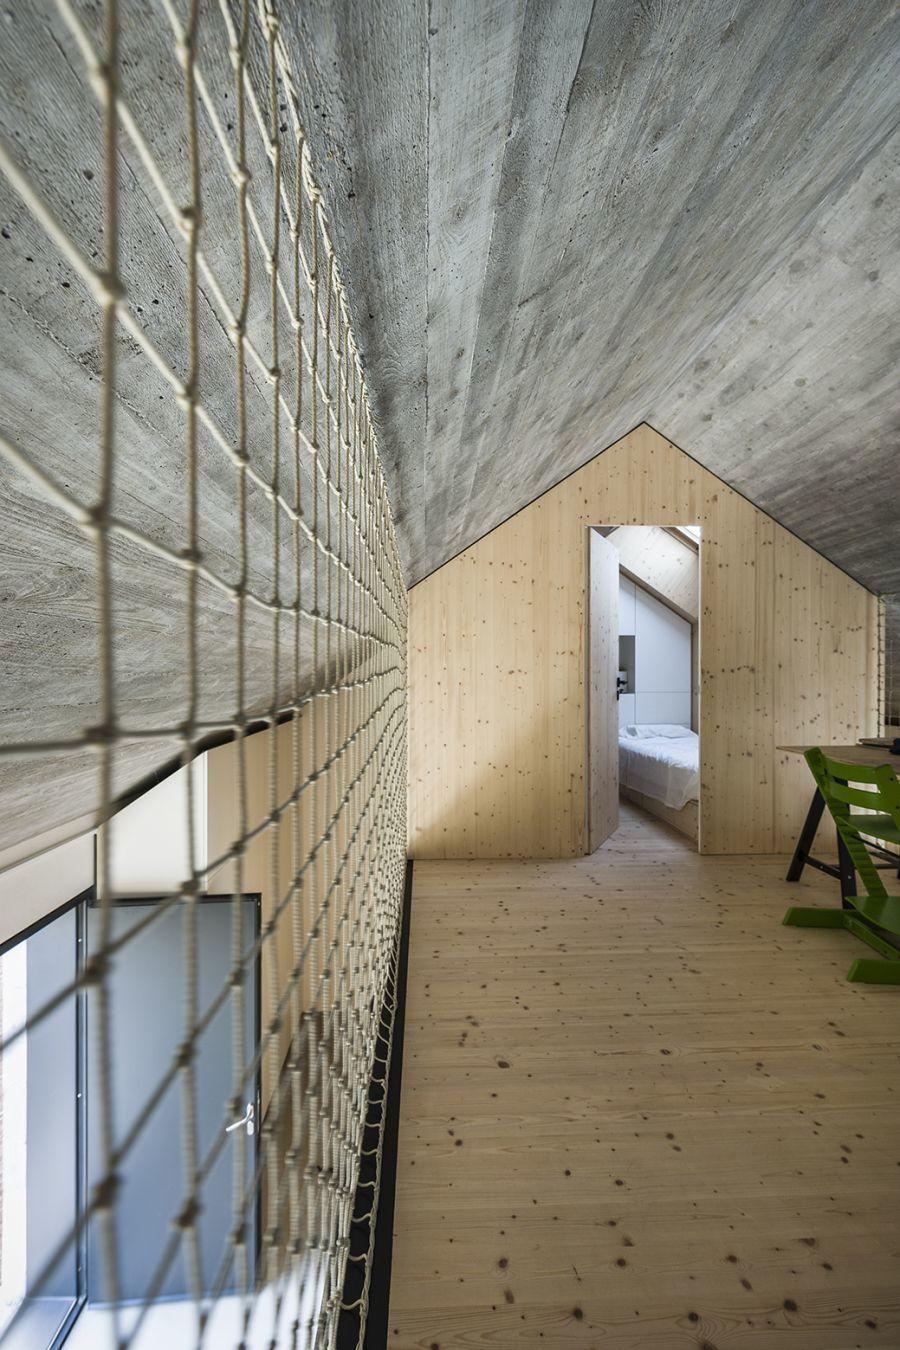 diaforetiko.gr : compact karst house dekleva gregori arhitekti interior design2 Εκπληκτικό! Εξοχικό σπίτι συνδυάζει άψογα την παραδοσιακή με τη μοντέρνα αρχιτεκτονική!!